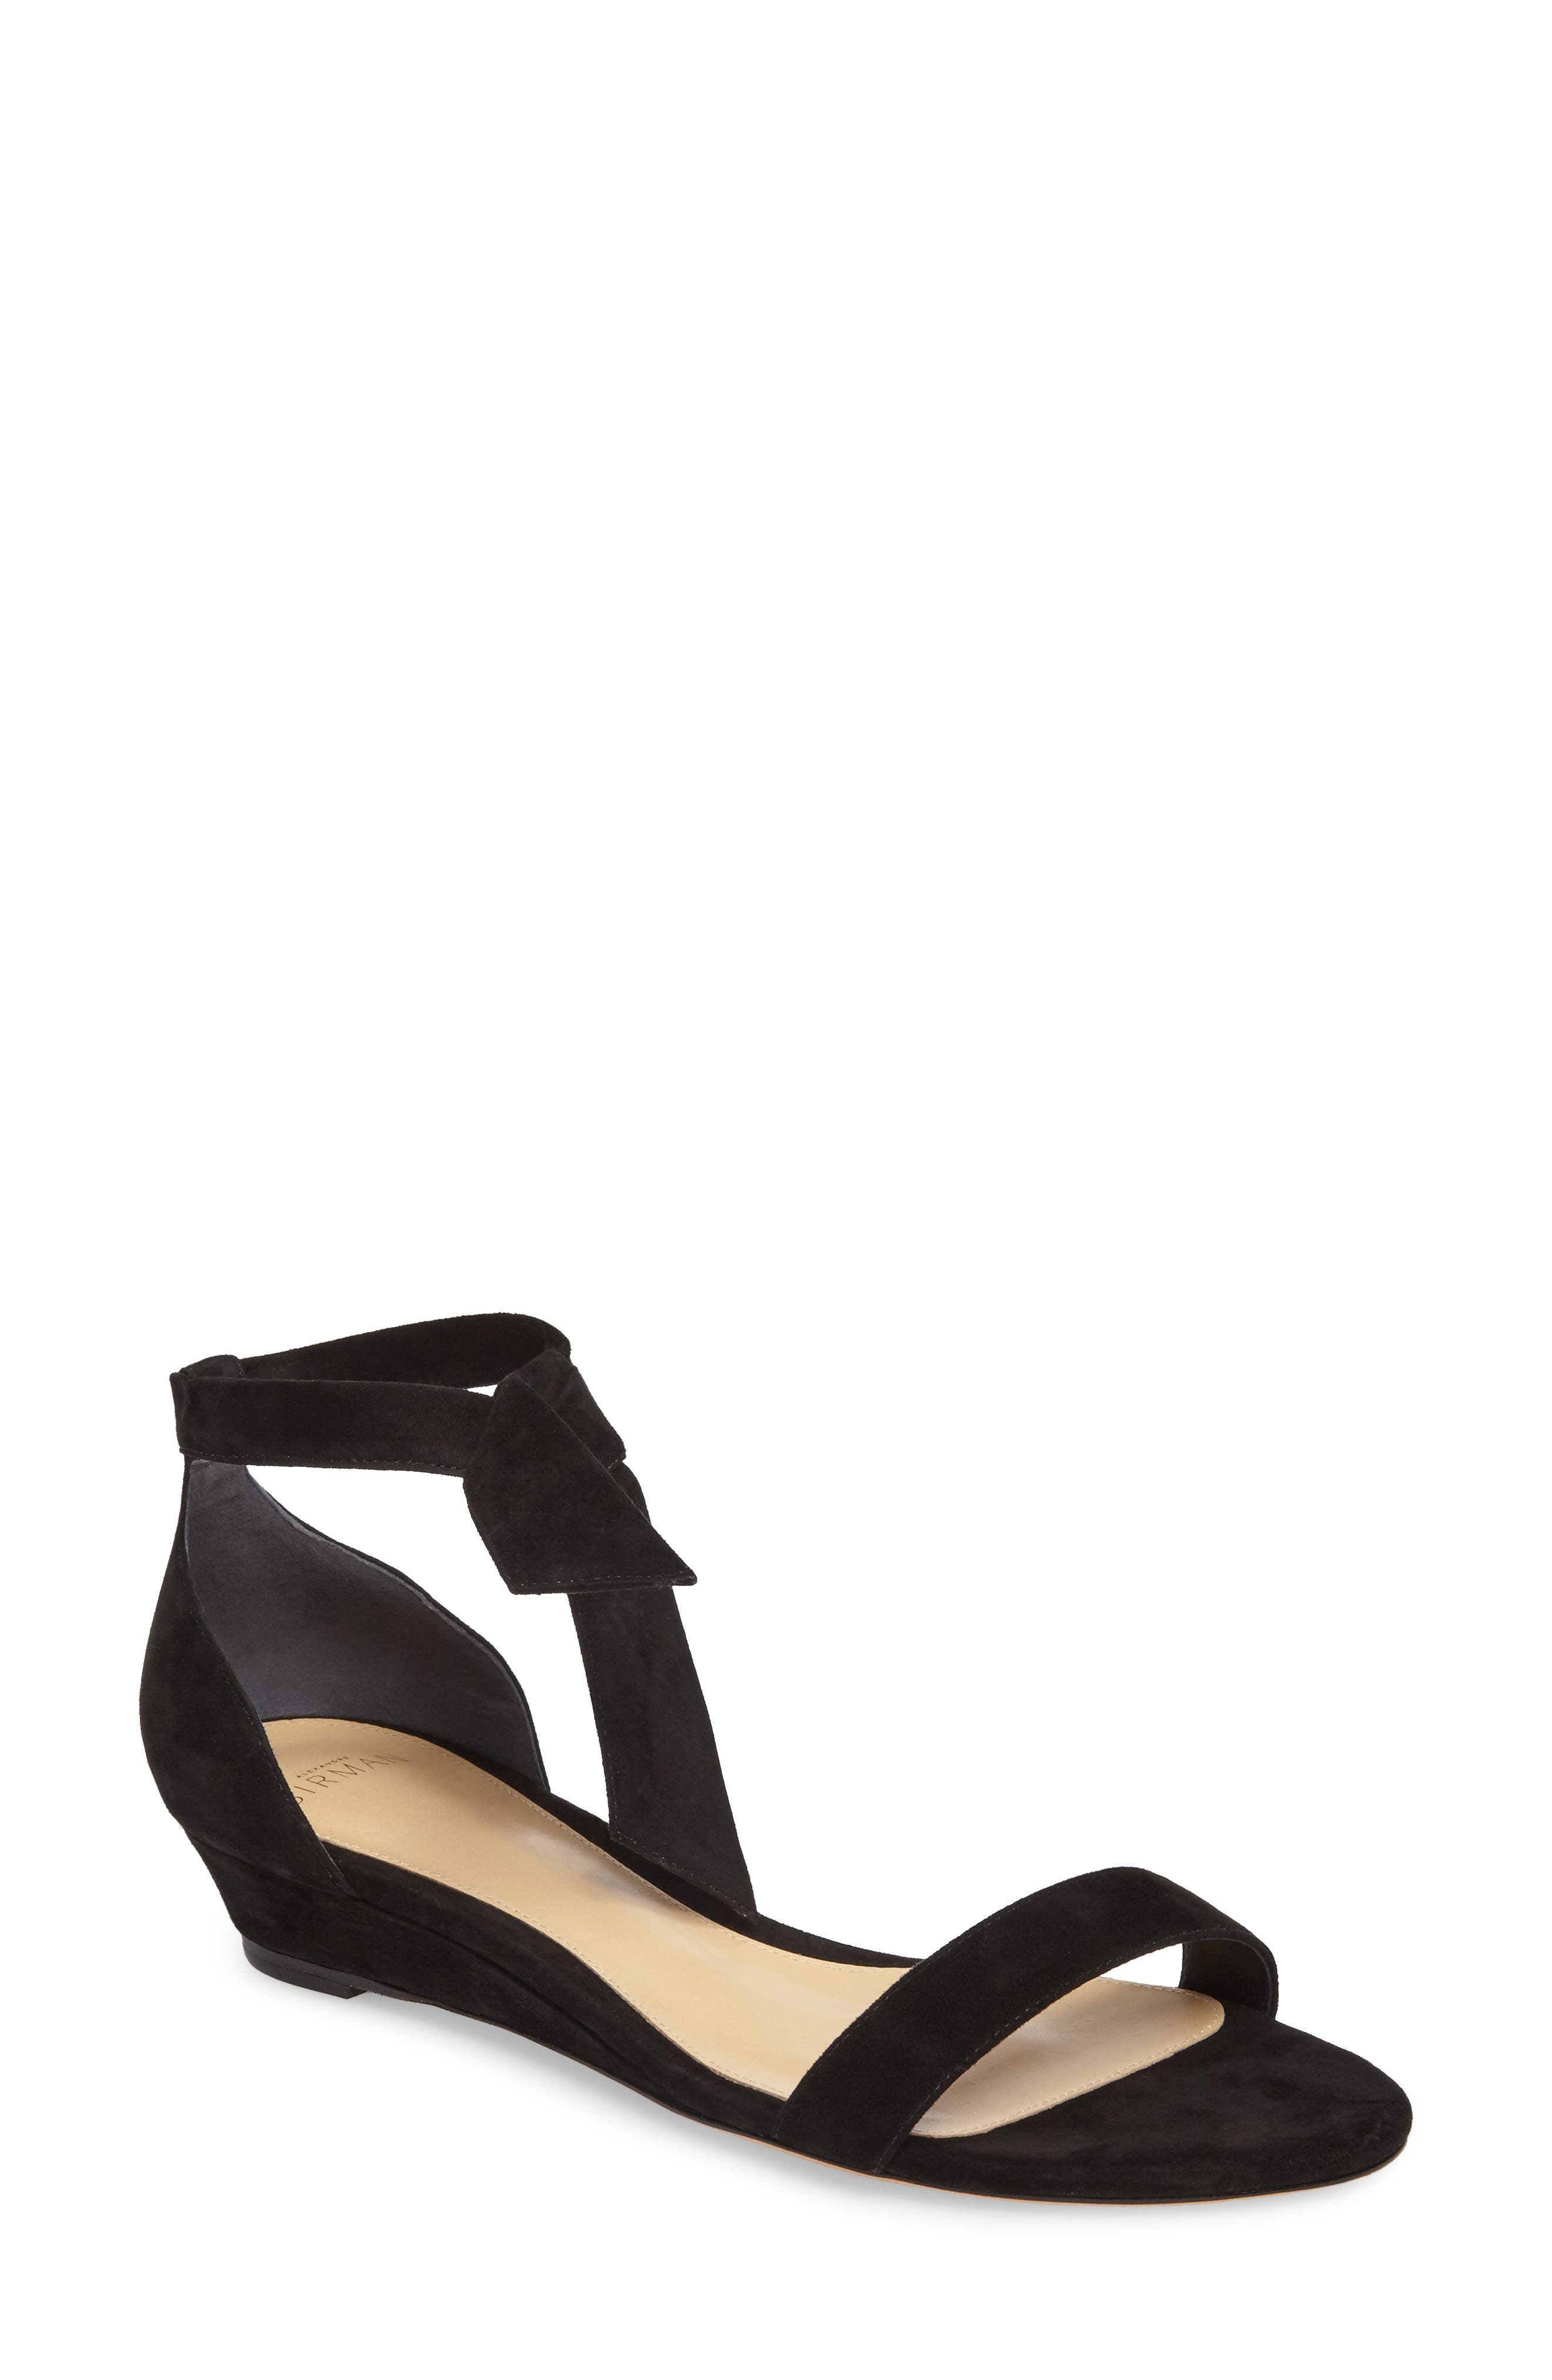 Atena Tie Strap Wedge Sandal,                             Main thumbnail 1, color,                             001